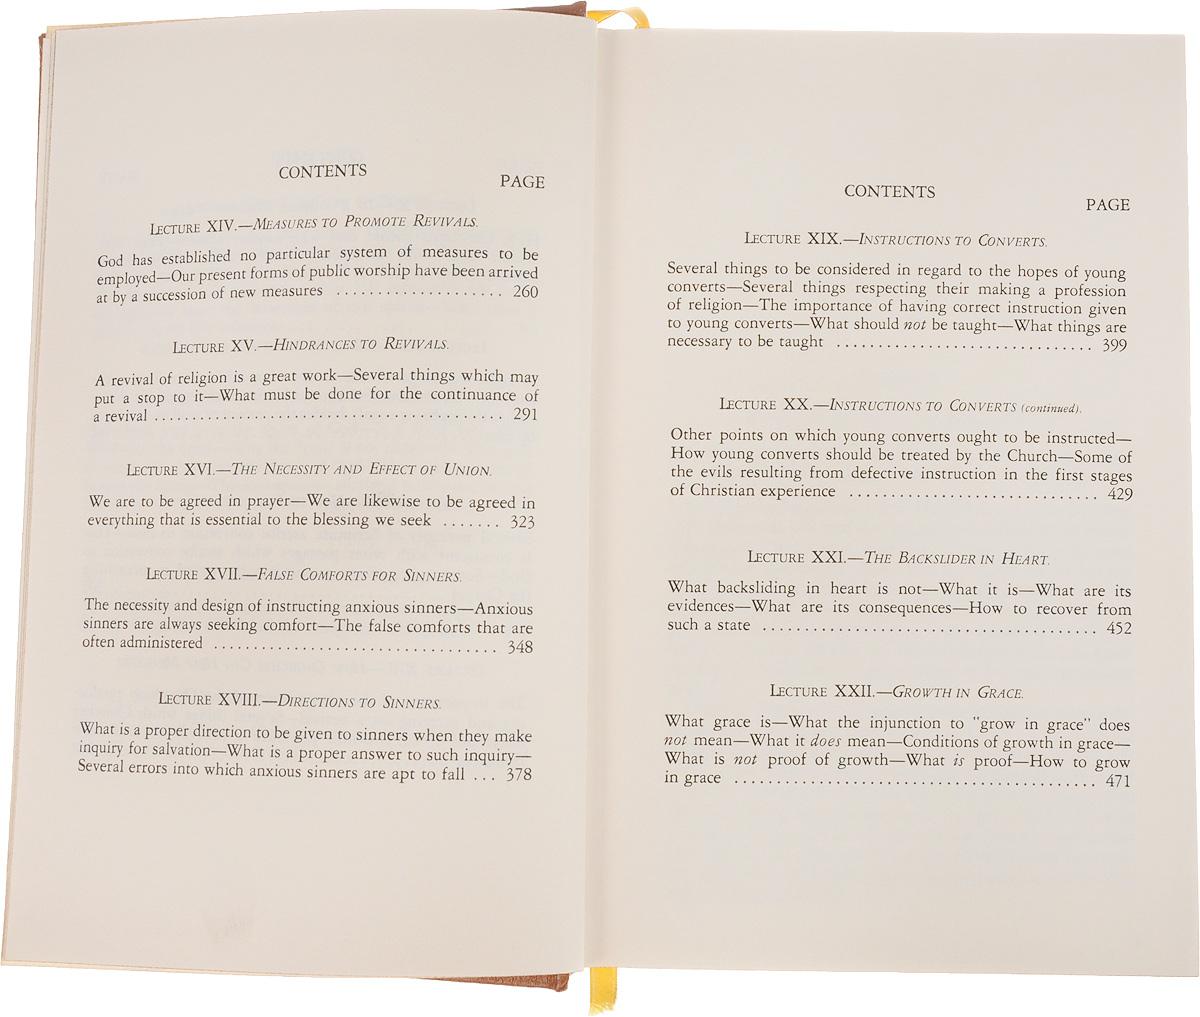 Revivals of Religion by Charles G. Finney С содержанием книги вы можете...